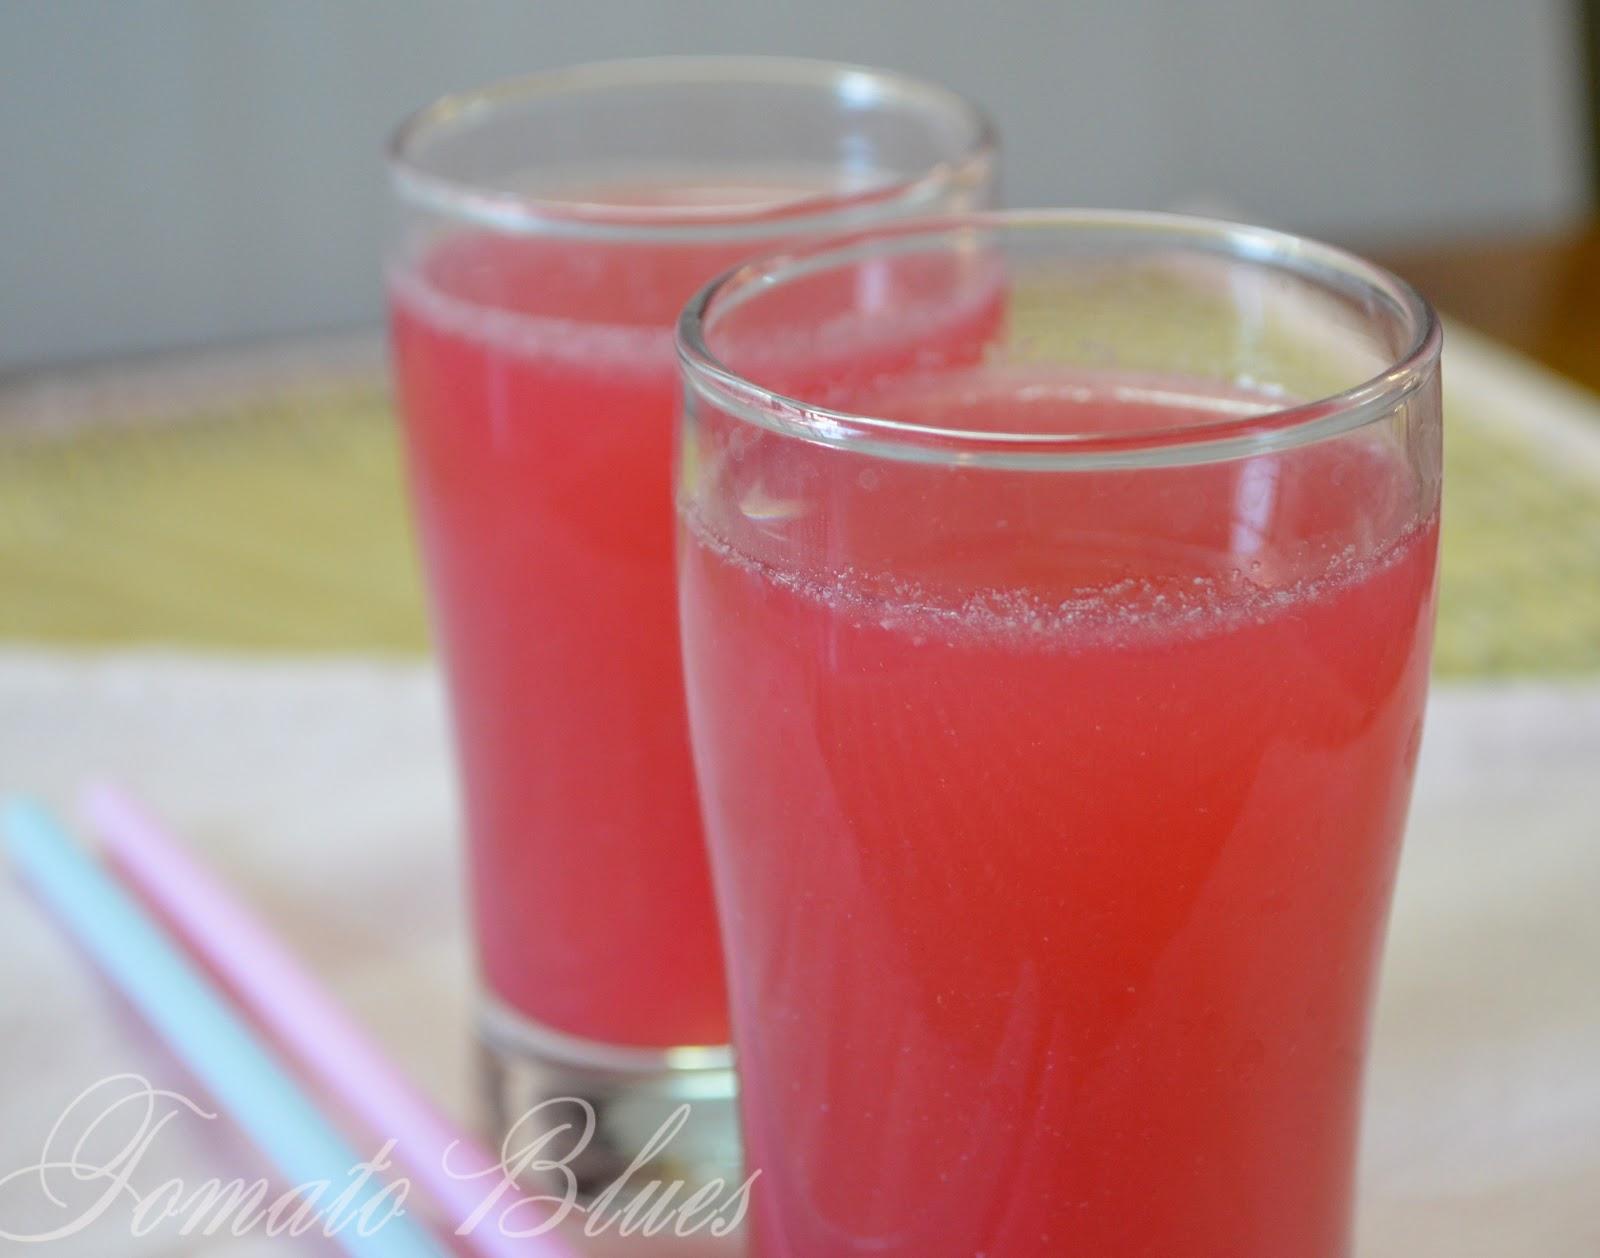 Pomegranate Spritzer - Mocktail Recipes - Tomato Blues